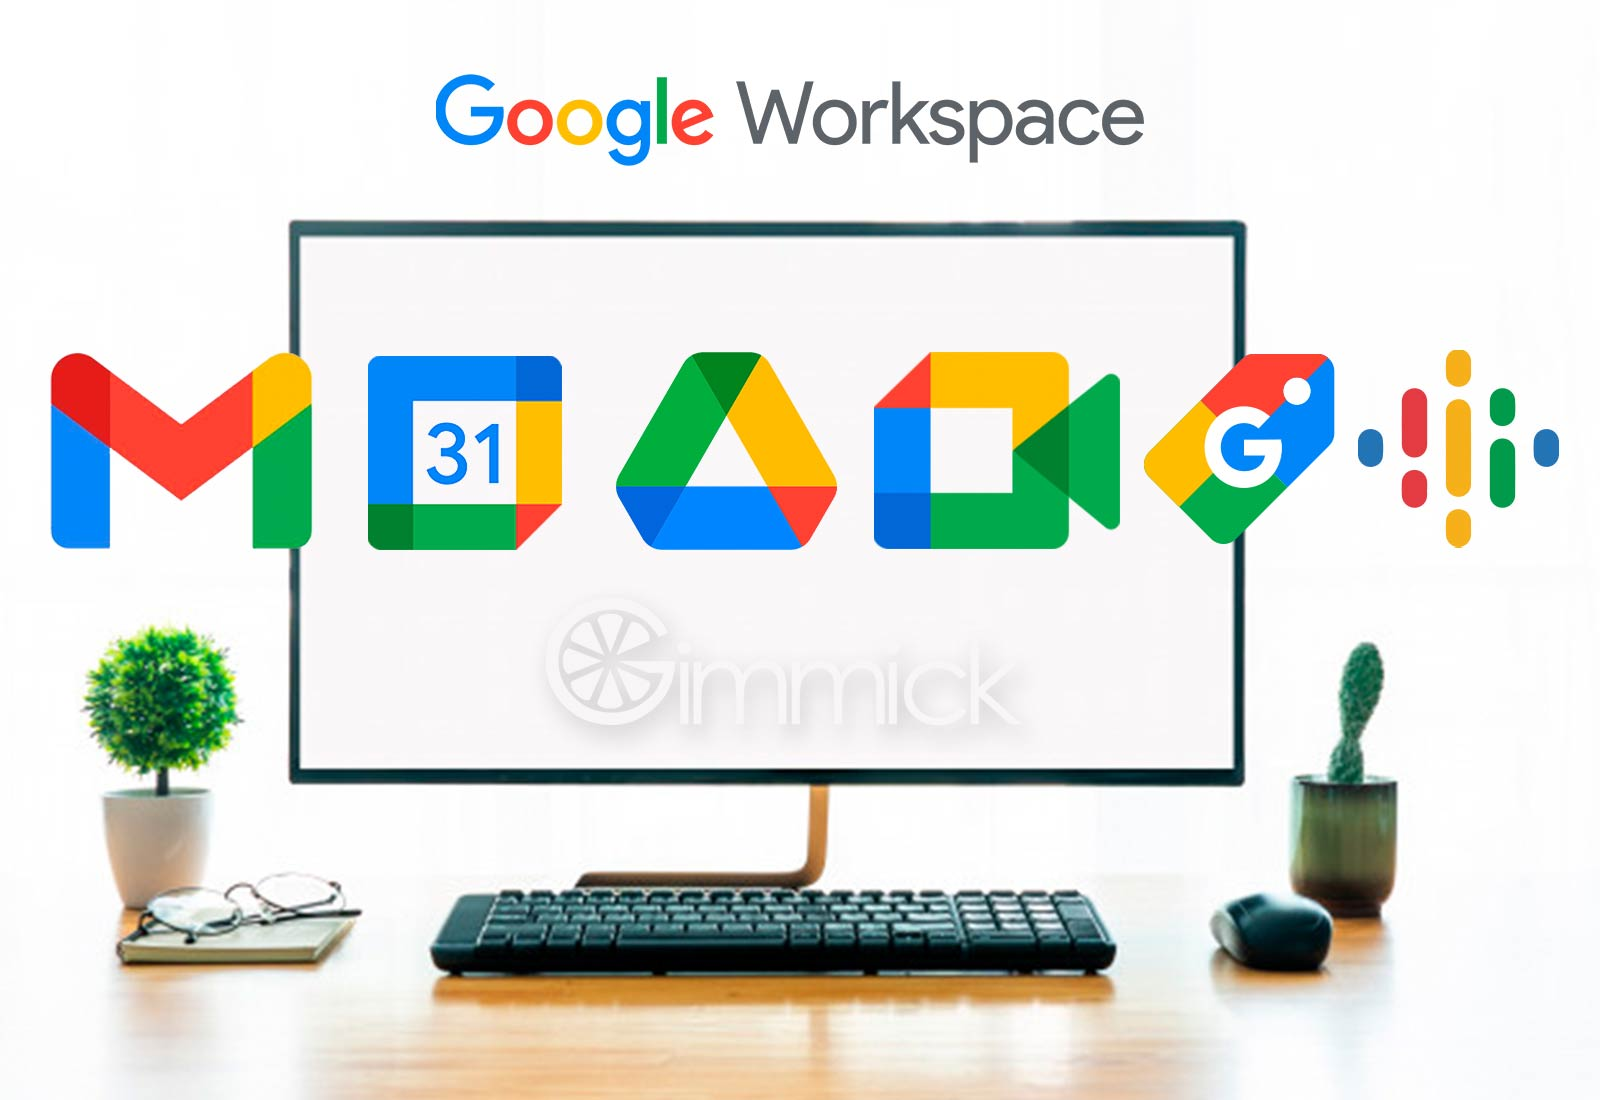 WorkSpace Google Agencia Gimmick